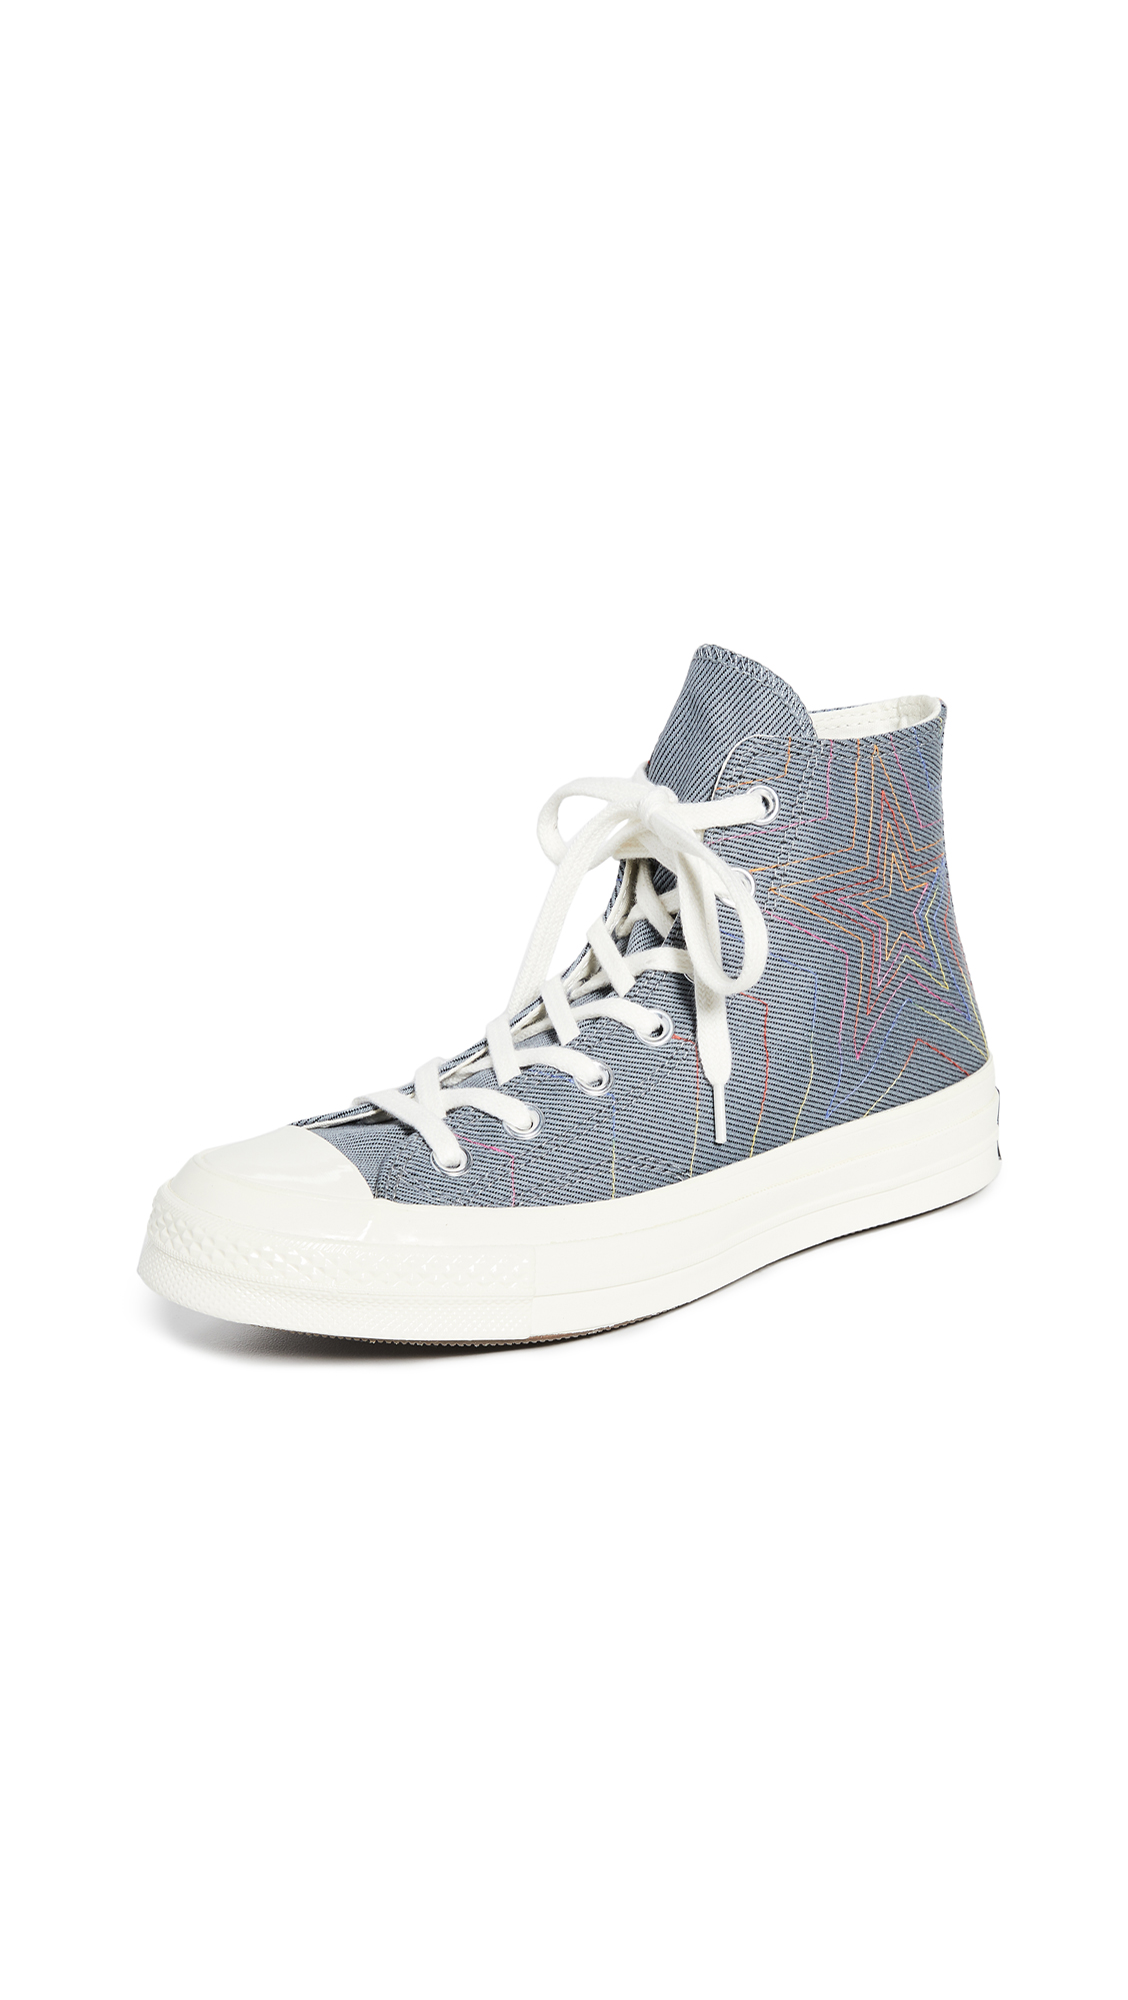 Chuck 70 Rainbow High Top Sneakers in BlackCool GreyEgret